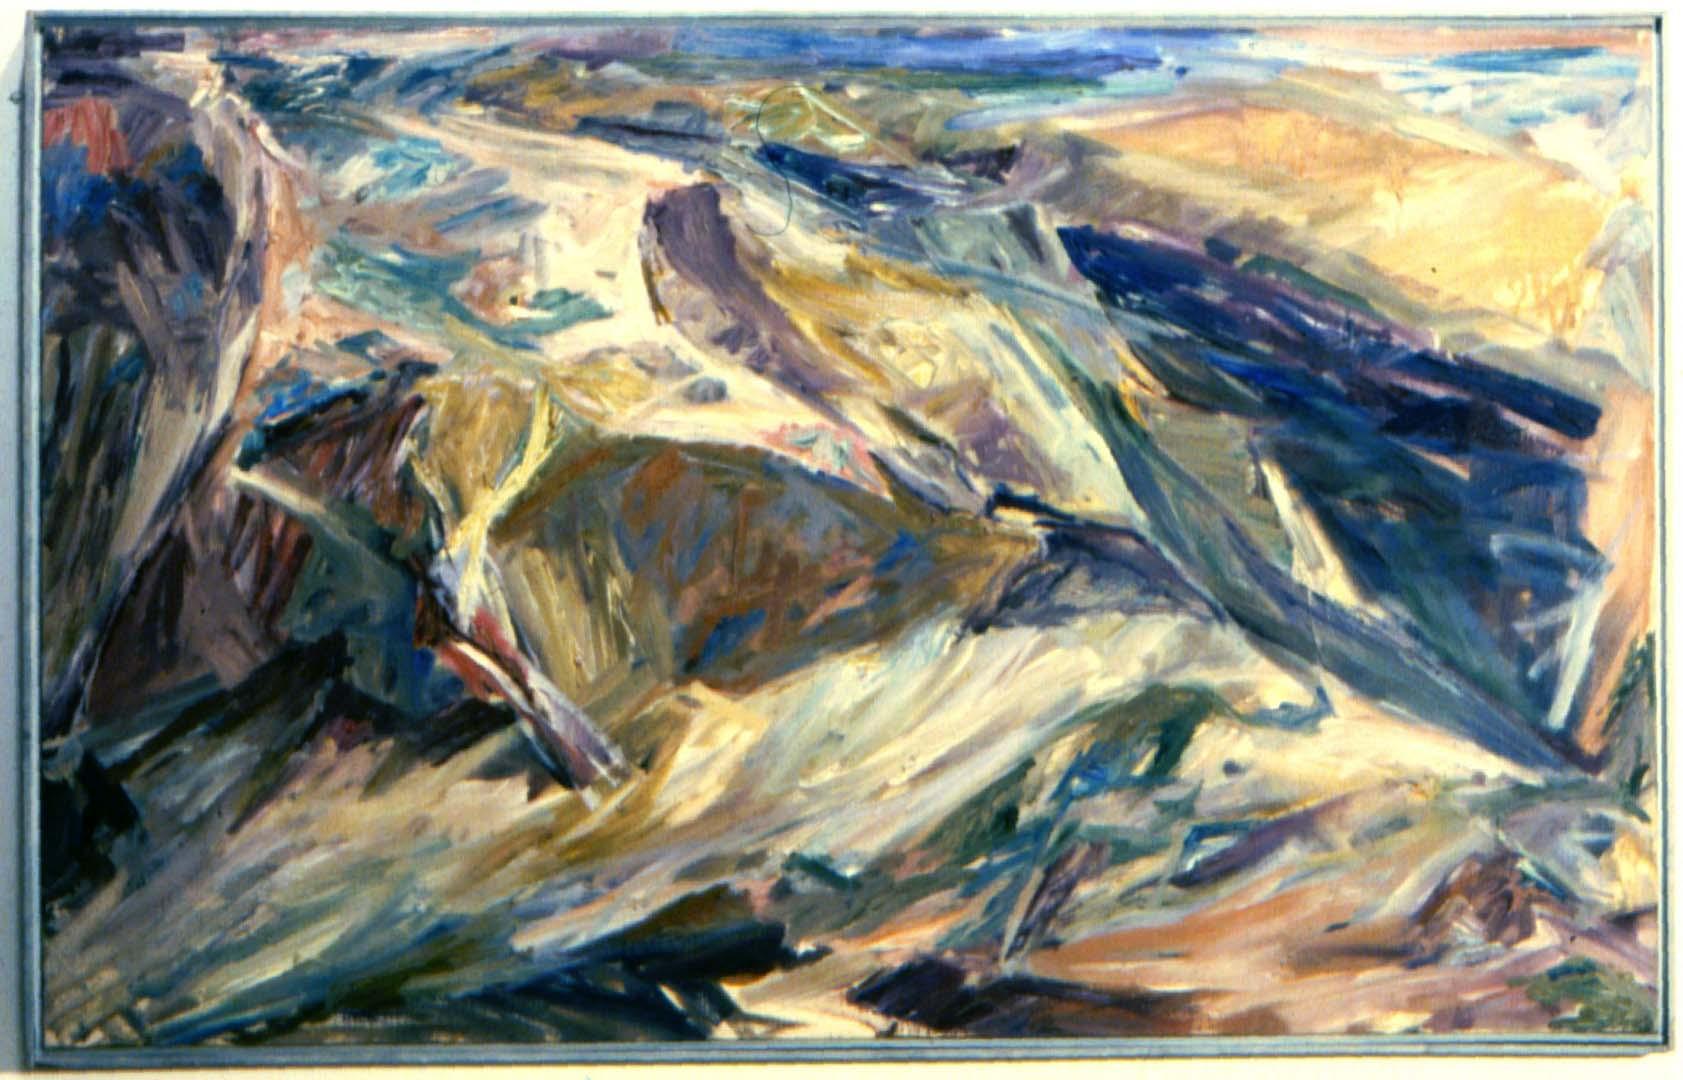 1955 Rocks and Sea Oil on Canvas